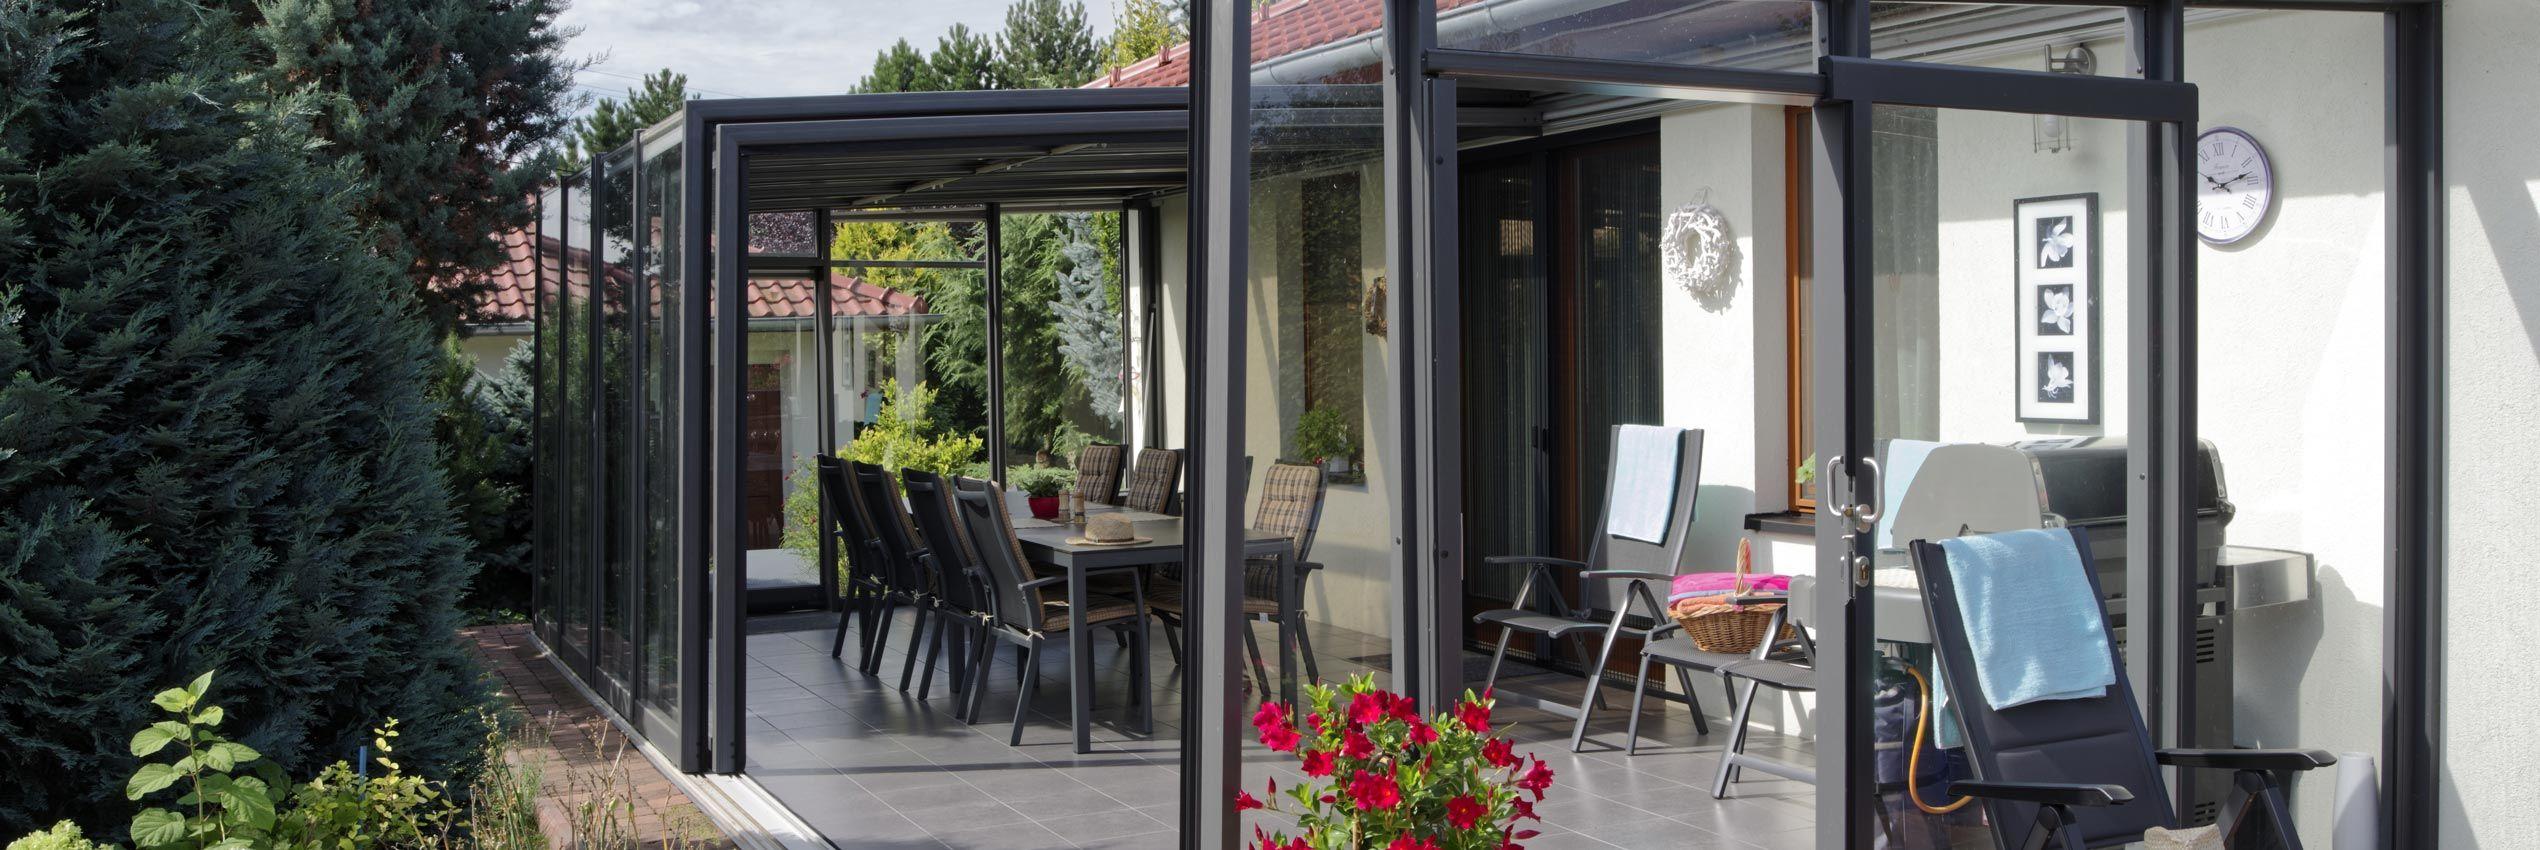 Closed retractable patio enclosure system CORSO Glass for HORECA